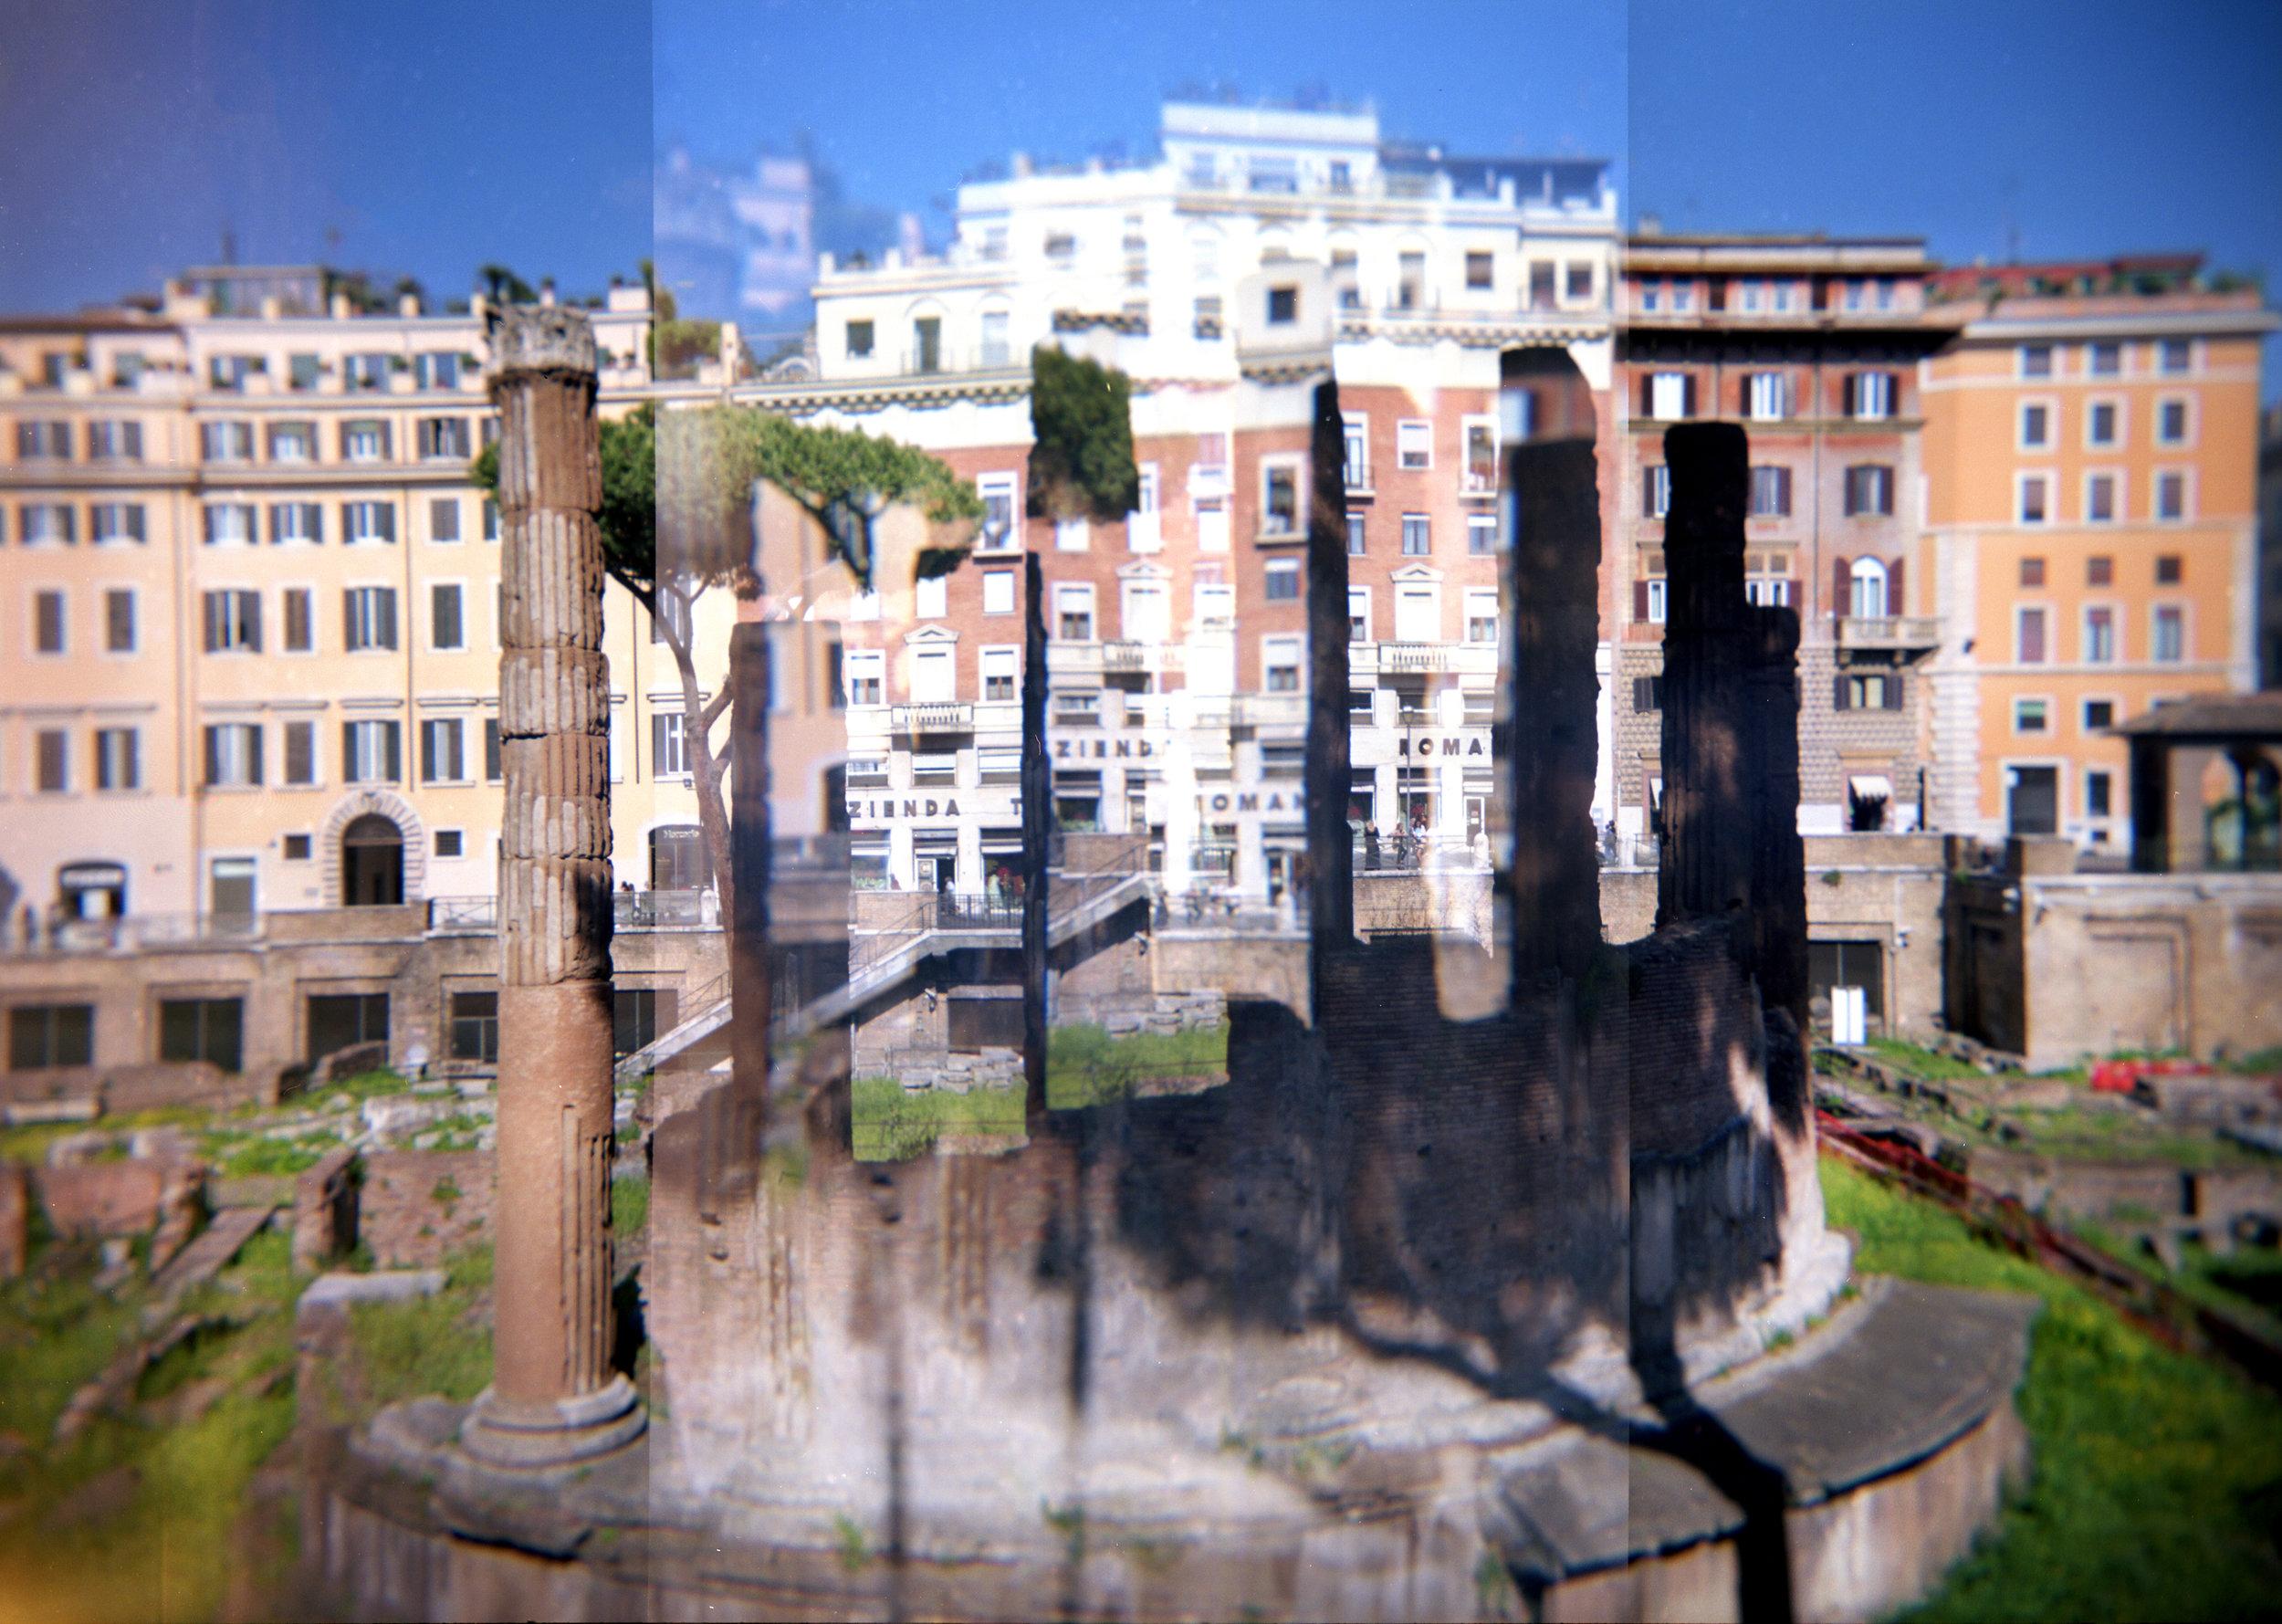 Italy020.jpg